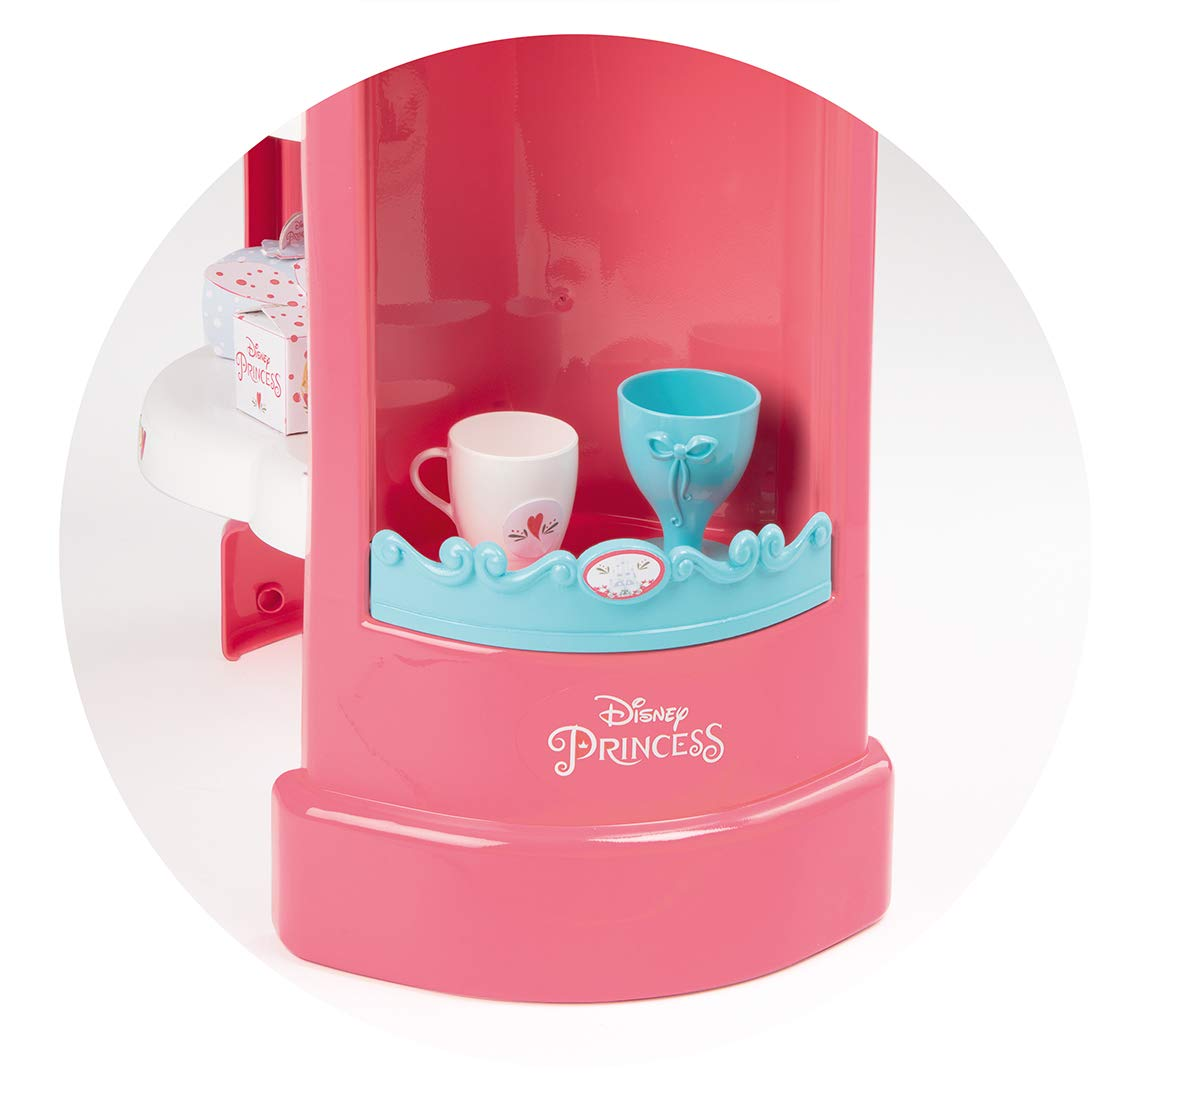 Smoby 311700 Disney Princess Küche, rosa: Amazon.de: Spielzeug